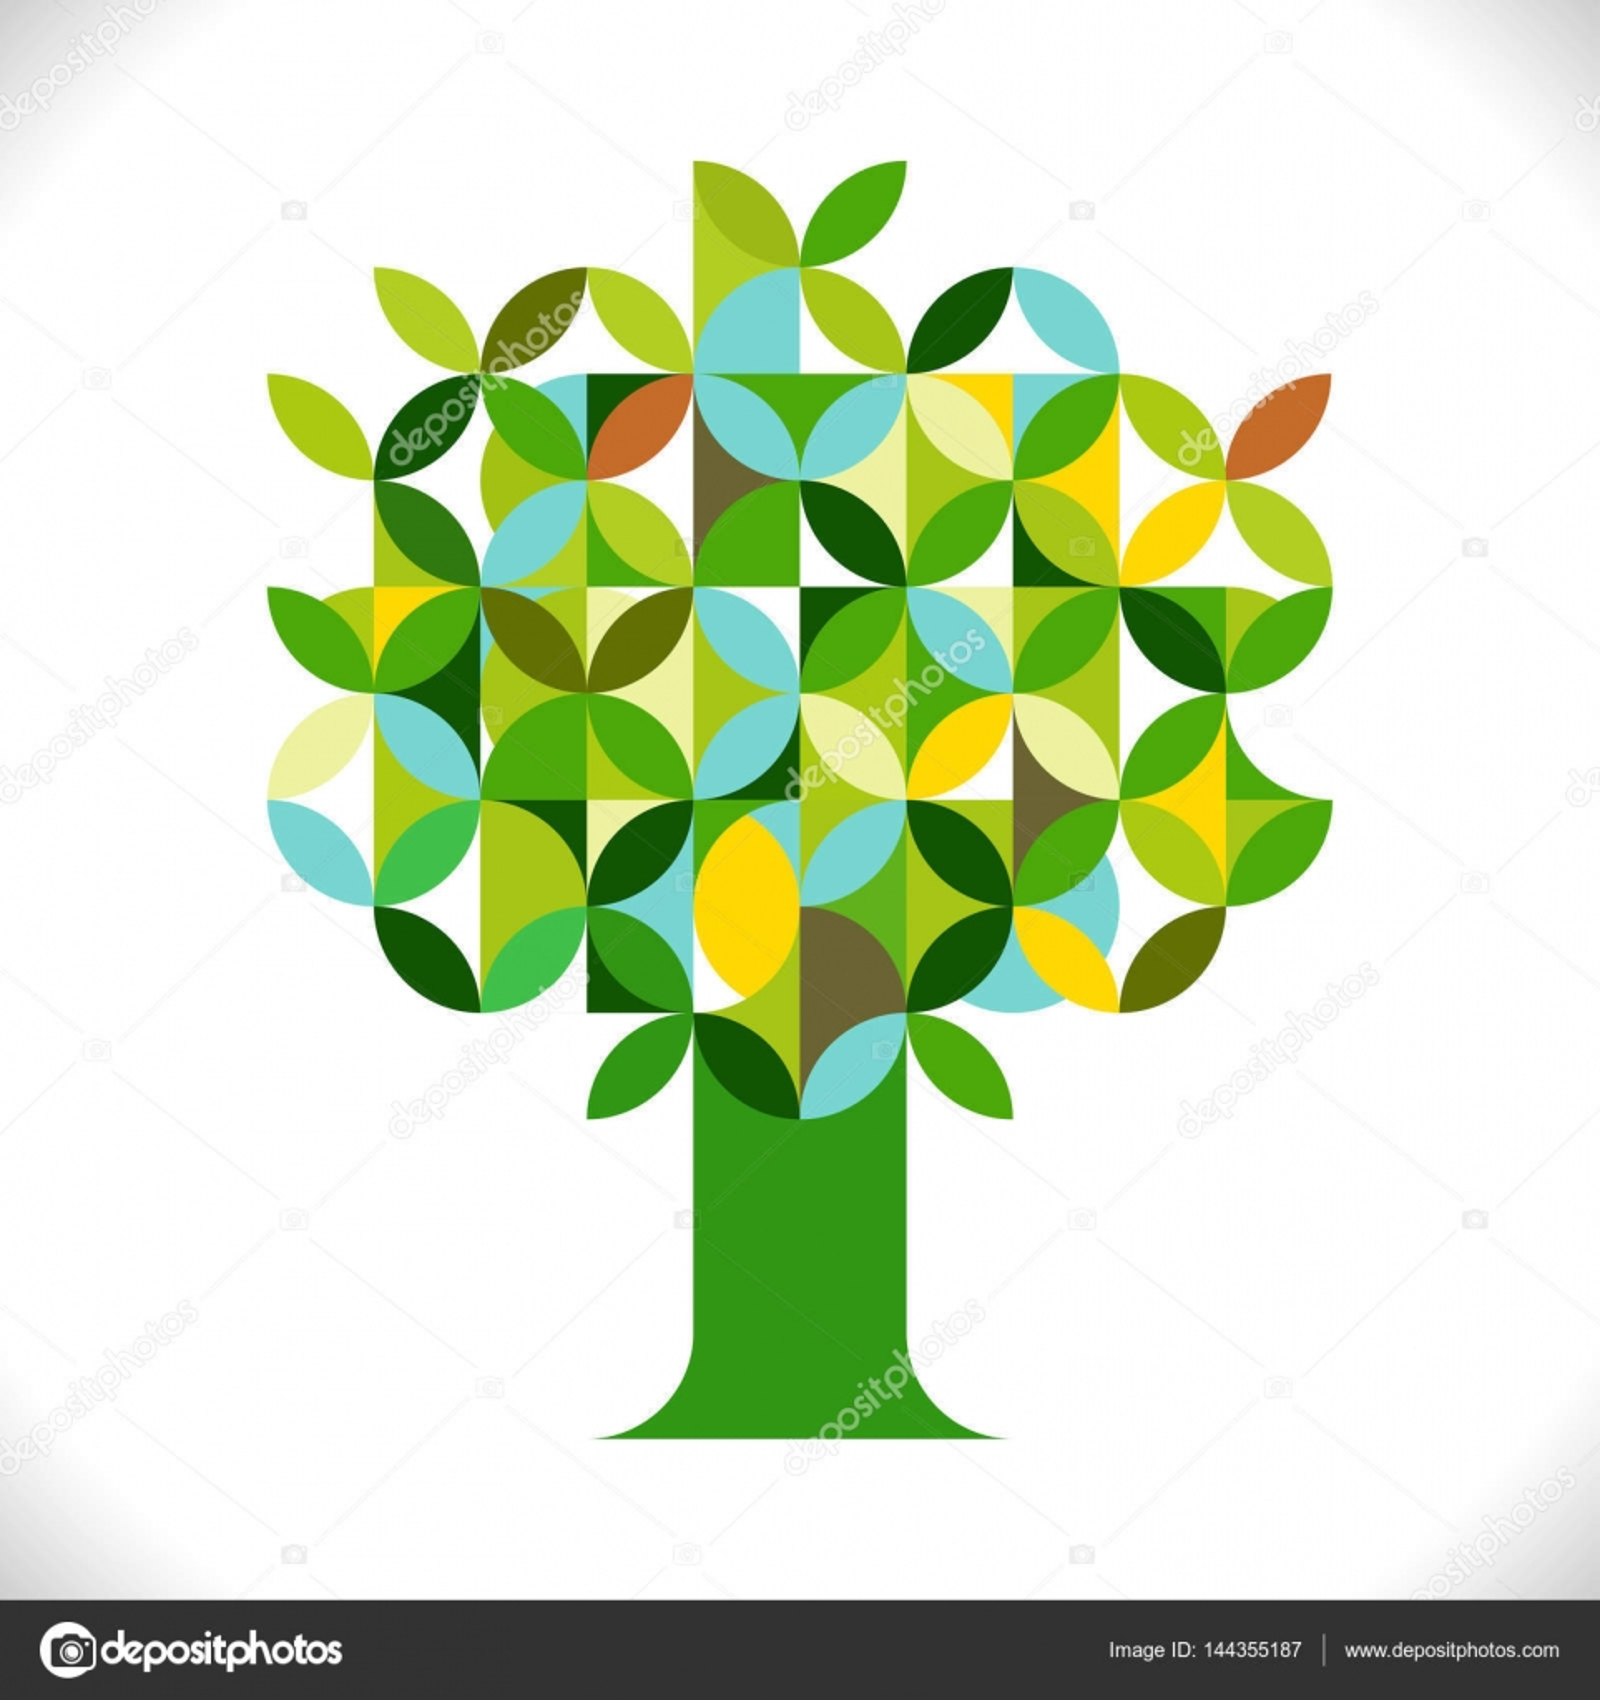 e5a23147a9a Δέντρο σύμβολο με γεωμετρικό σχέδιο έννοια απομονωμένα σε λευκό. ΜΕΓΑΛΩΝ  ΕΠΙΧΕΙΡΗΣΕΩΝ ταυτότητα σχεδιασμού, ηλεκτρονική παρουσίαση ιστοσελίδας  στοιχείο, ...